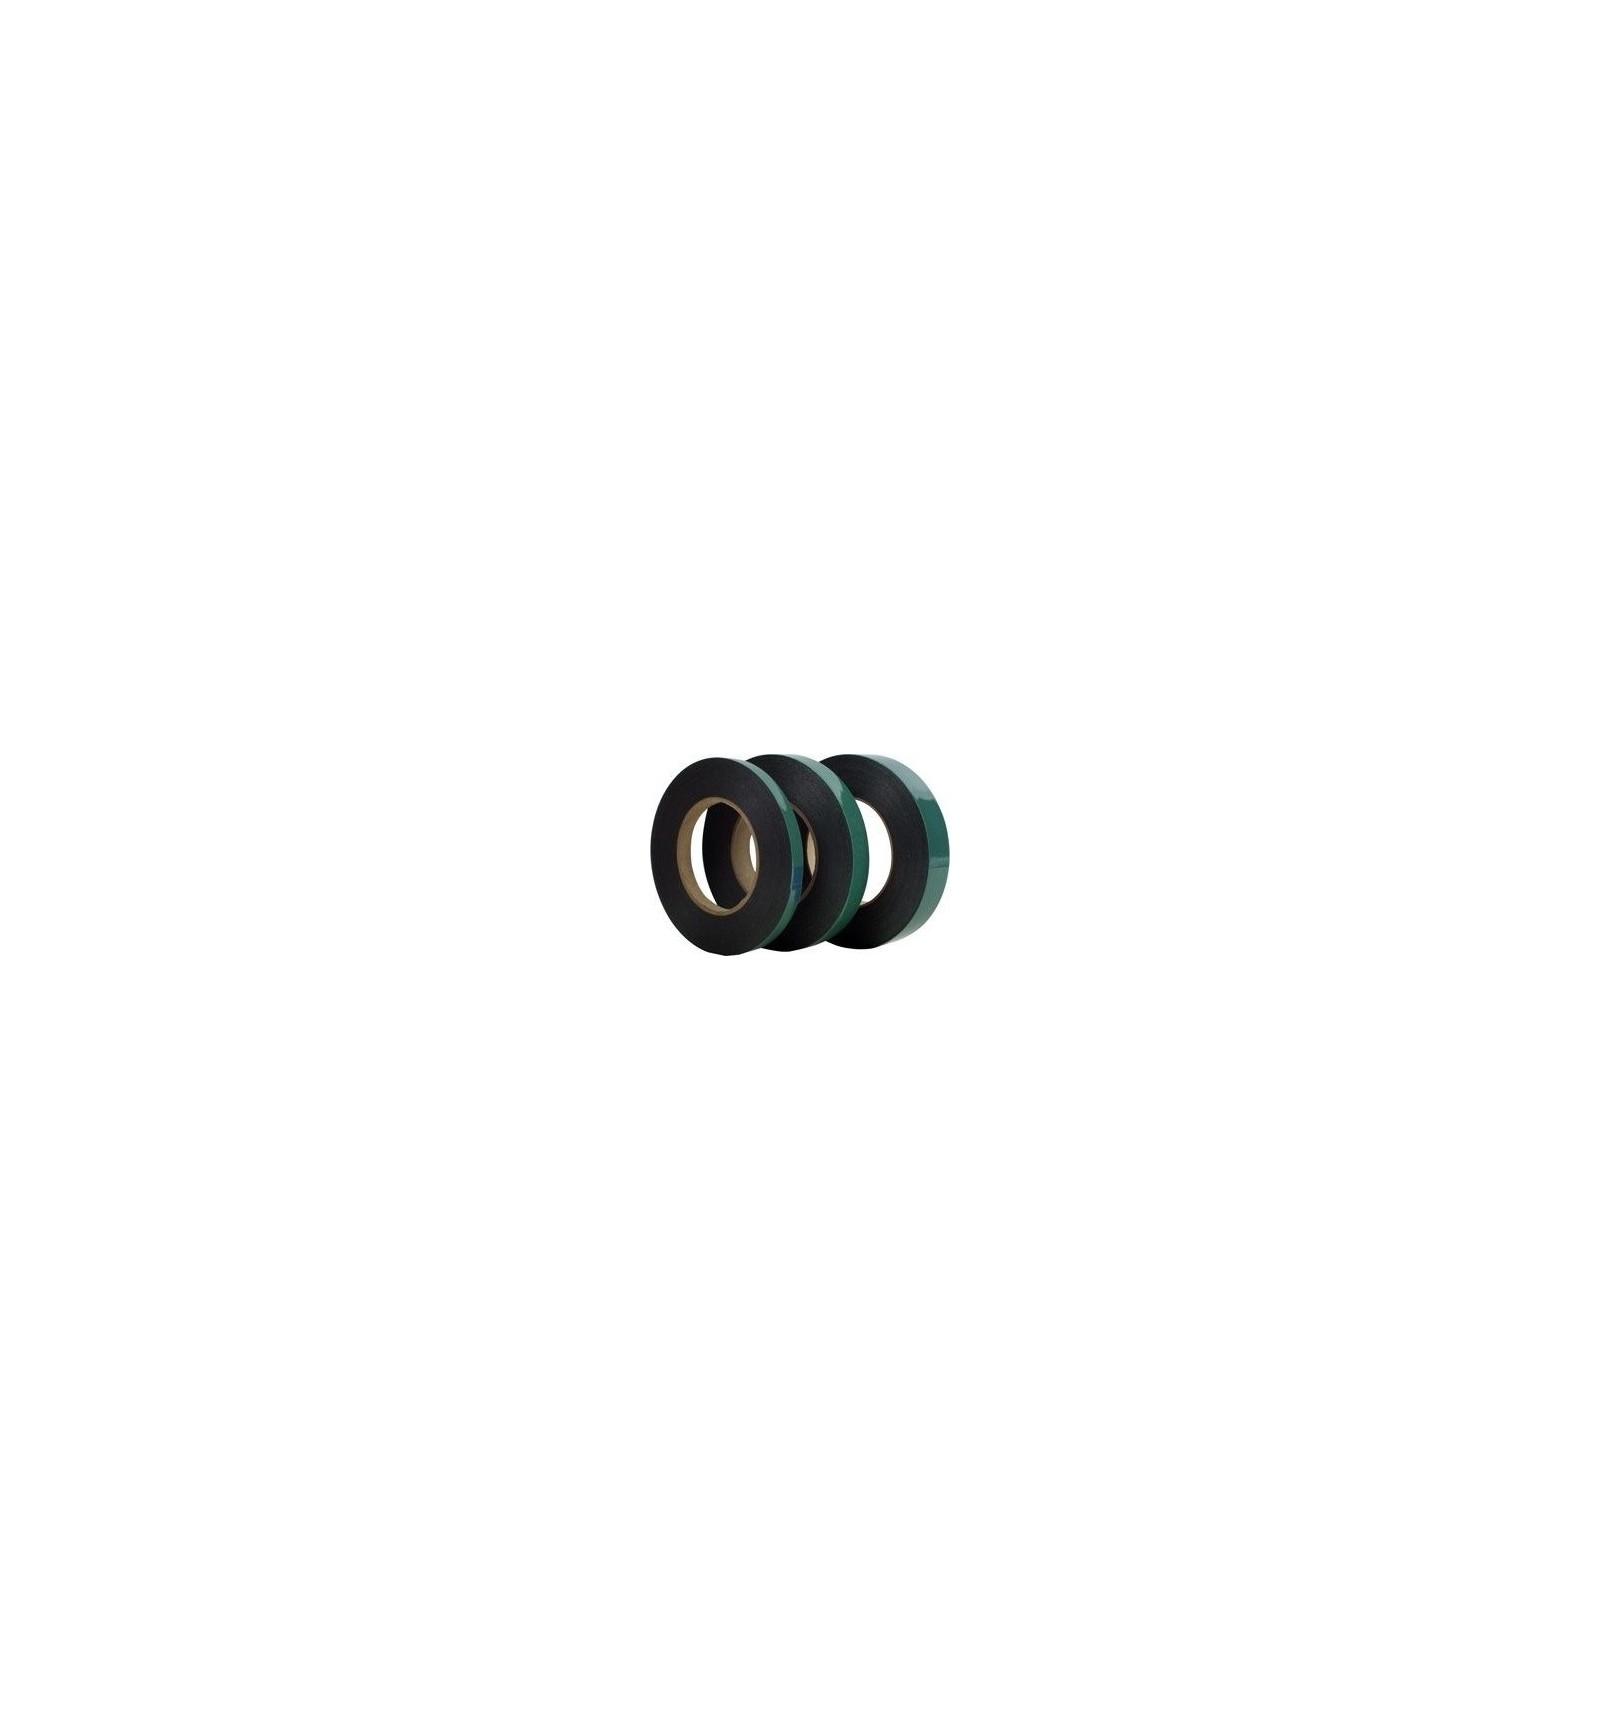 Tex D S Badge Tape 9mm X 10m Commercial Paint Supplies